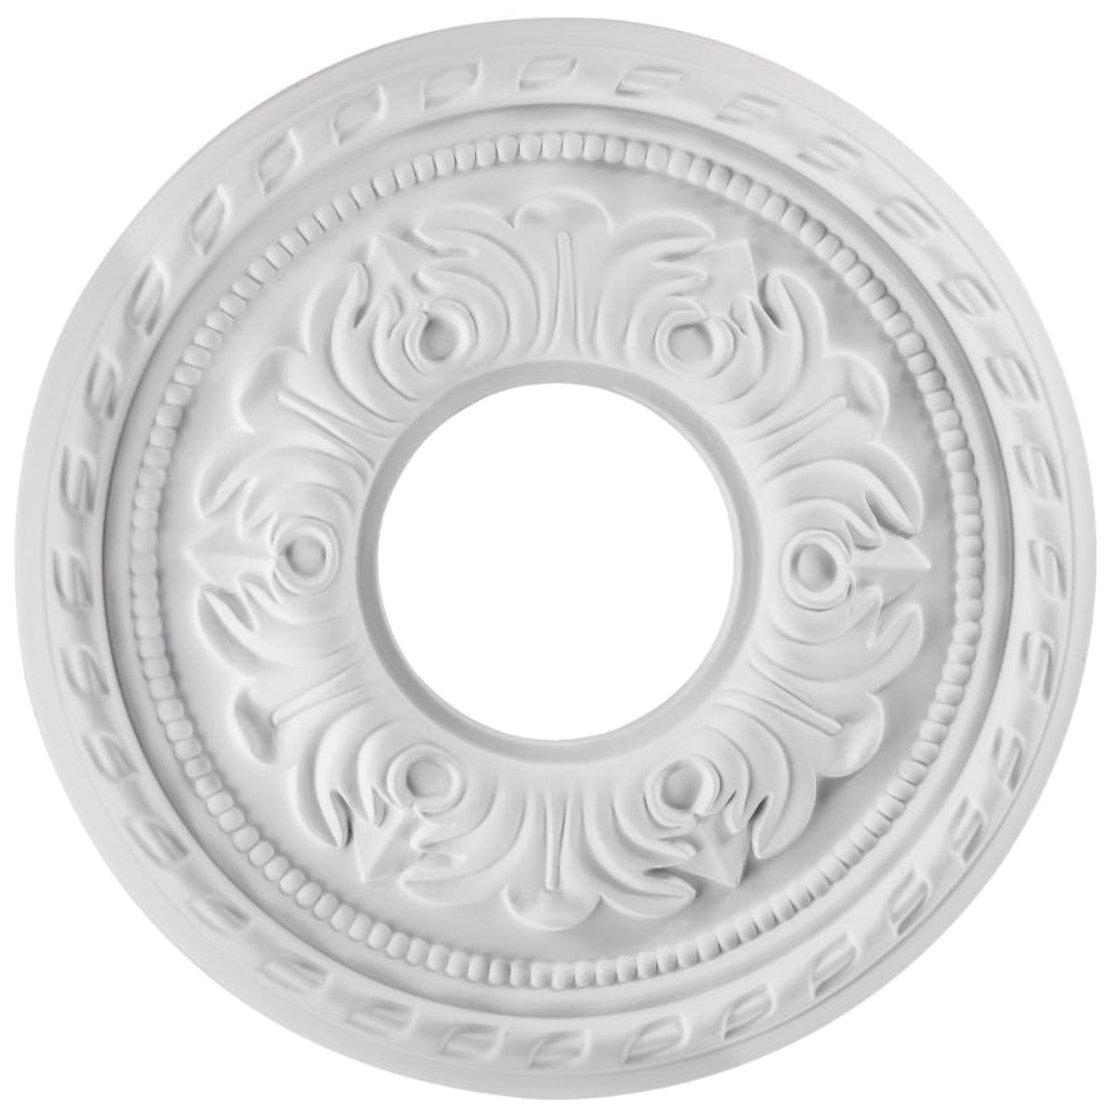 Westinghouse 7770900 12-Inch White Finish Violetta Ceiling Medallion